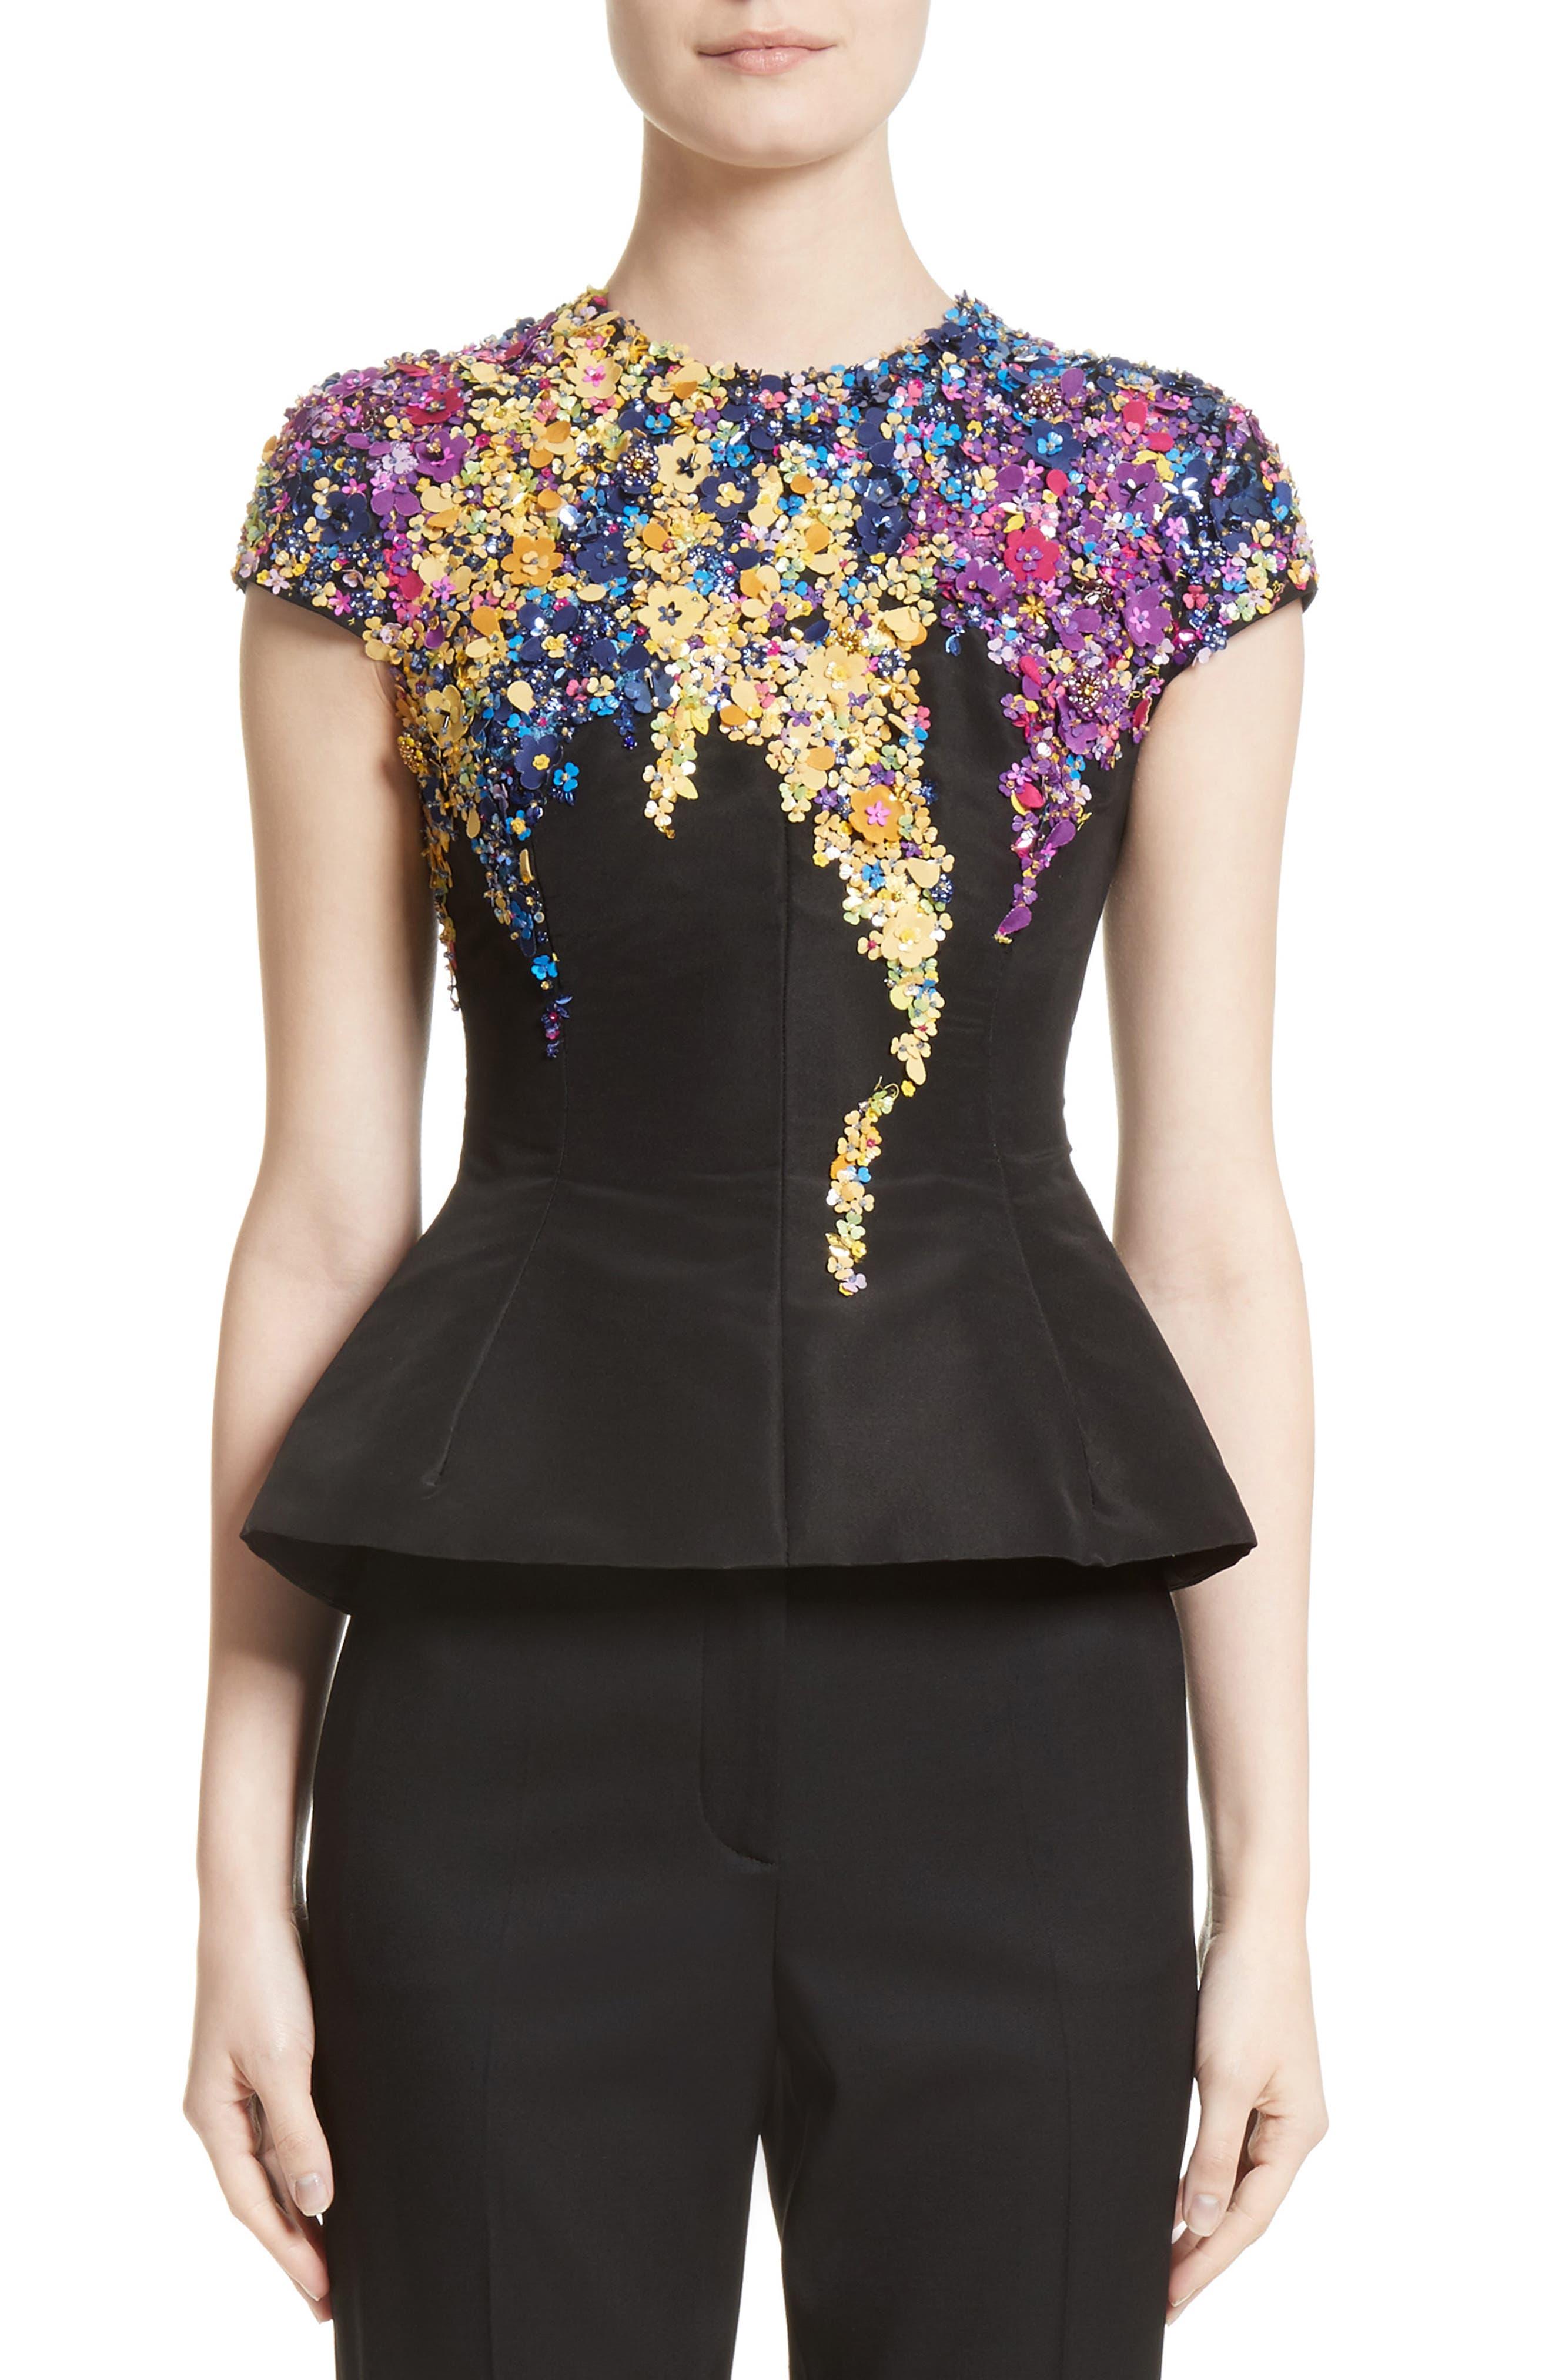 Alternate Image 1 Selected - Oscar de la Renta Tendrils Floral Embroidered Silk Faille Top